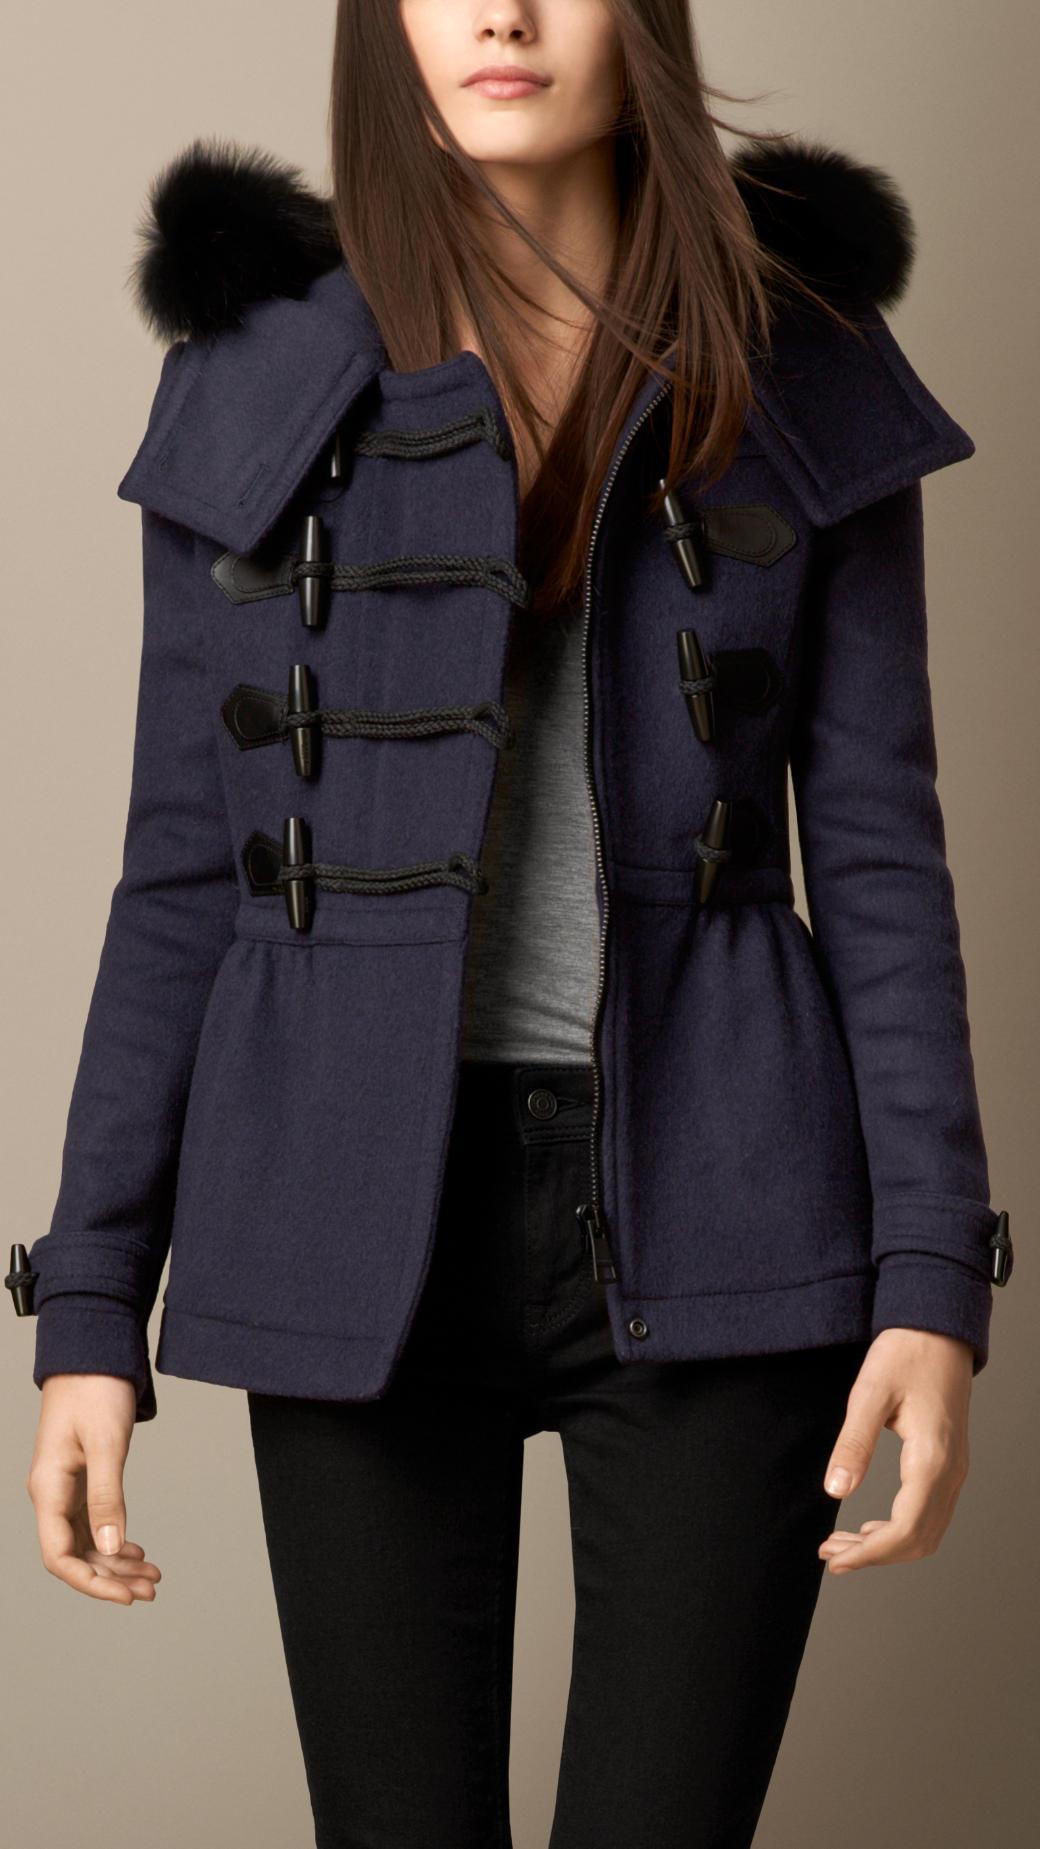 Burberry Fur Trim Peplum Duffle Coat in Blue | Lyst